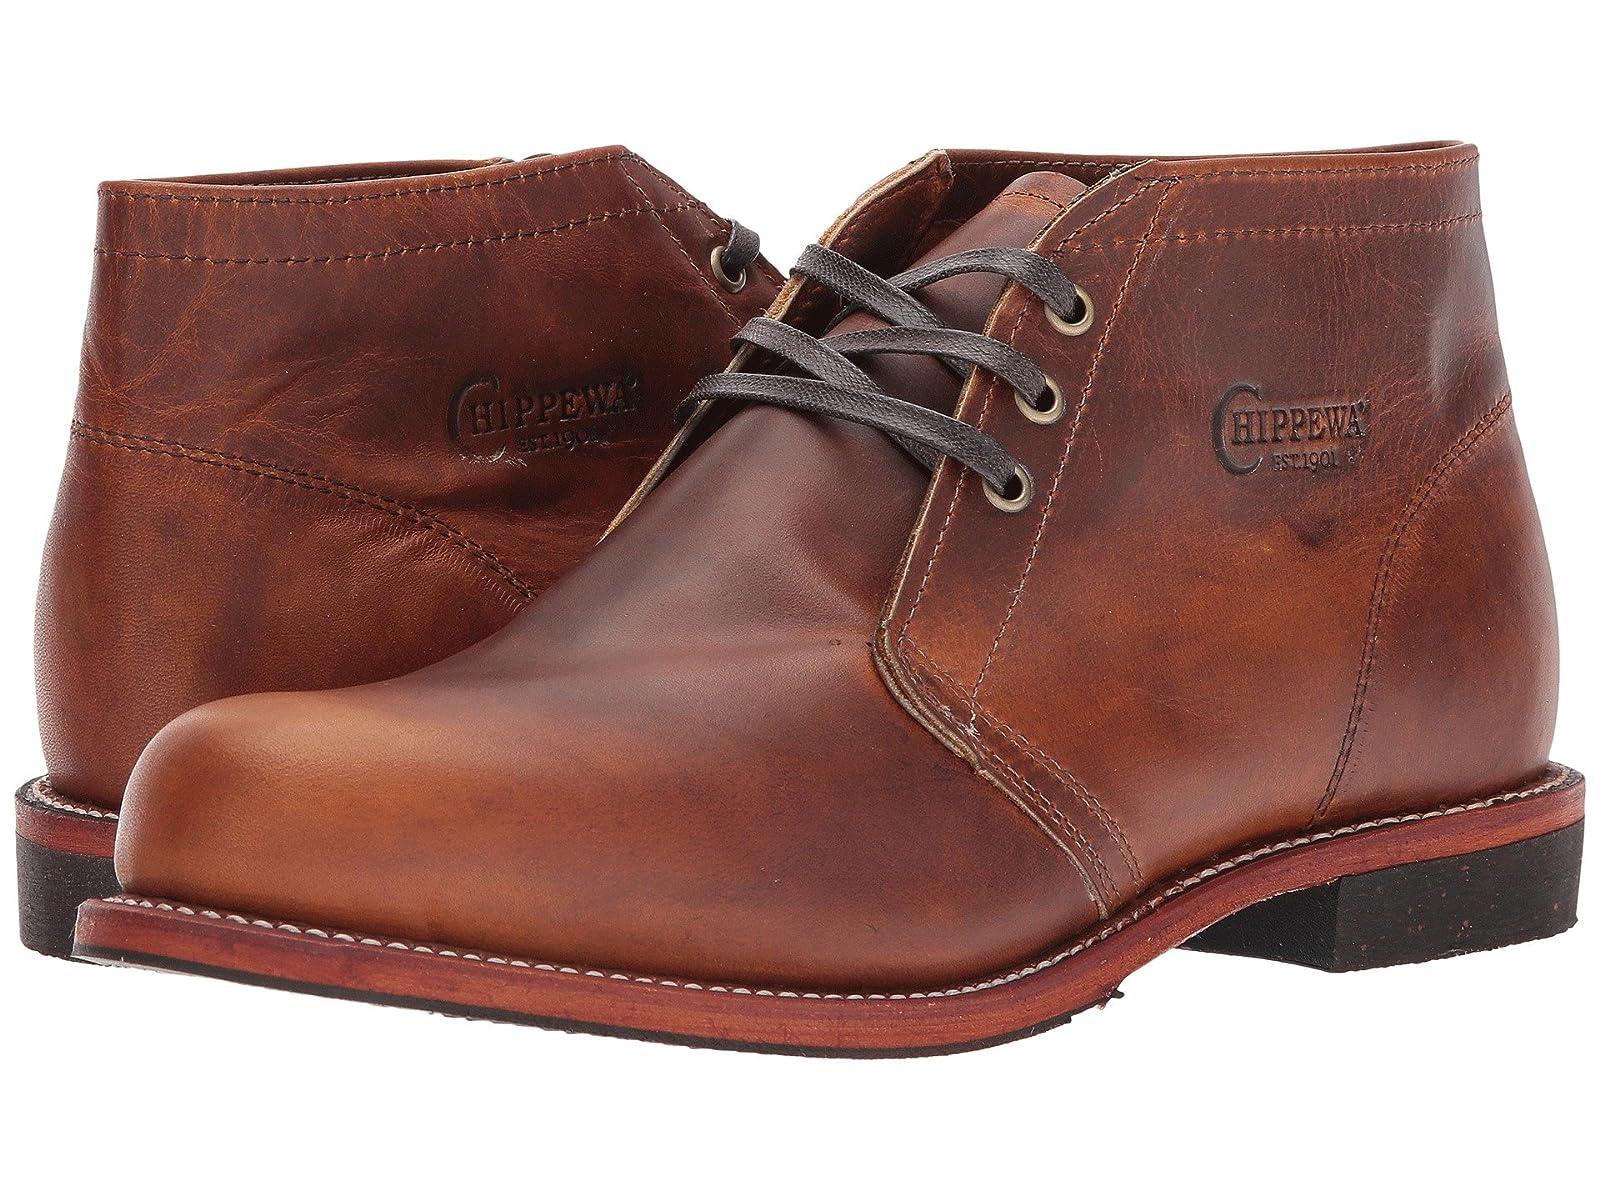 "Chippewa 5"" Renegade Dress ChukkaCheap and distinctive eye-catching shoes"